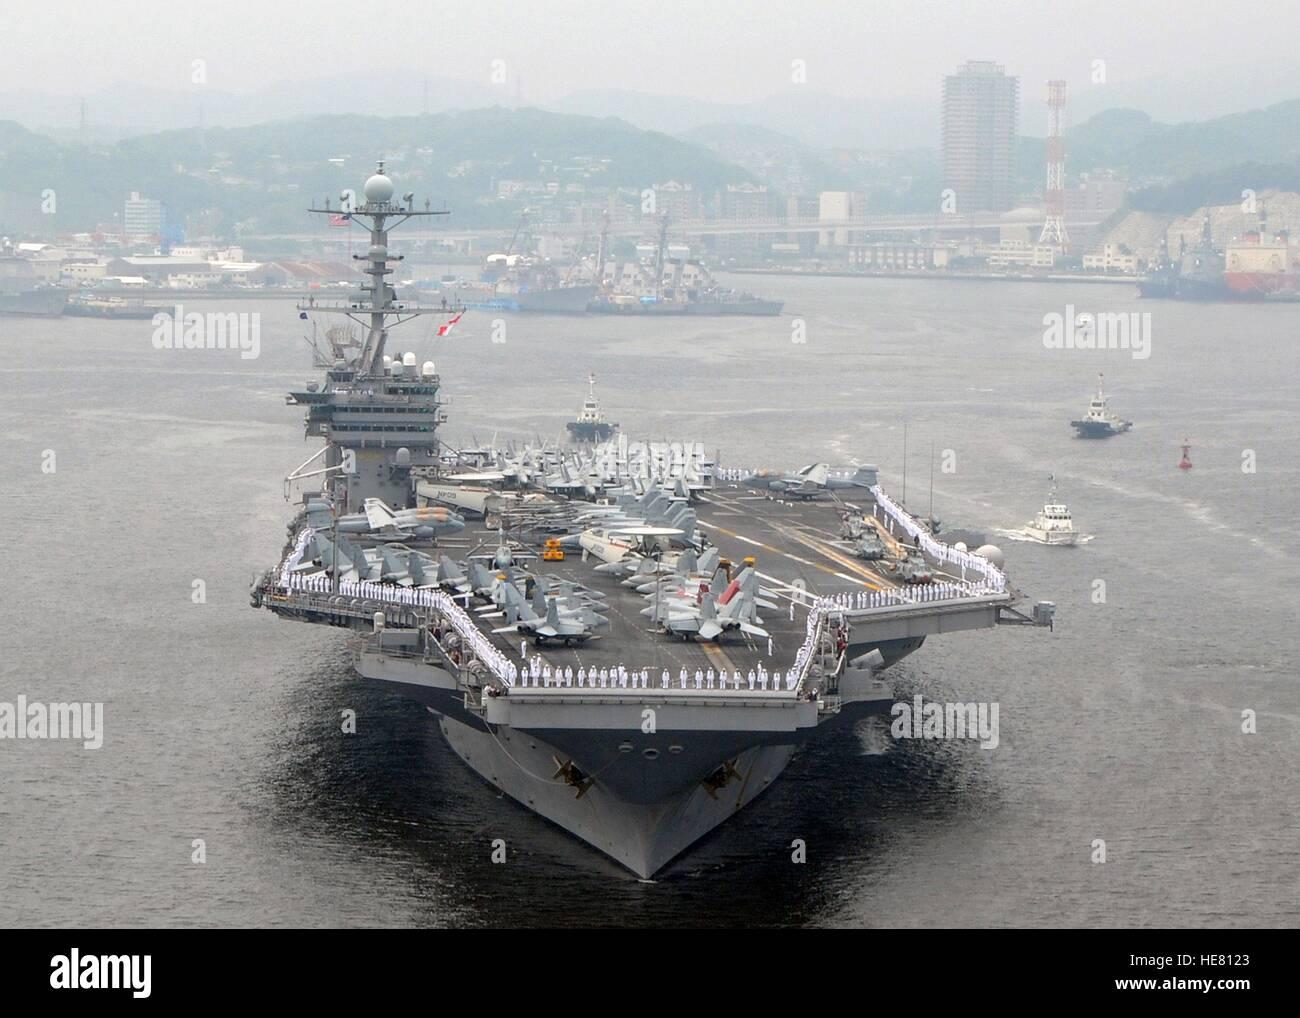 U.S. sailors man the rails aboard the USN Nimitz-class aircraft carrier USS George Washington as it departs the - Stock Image